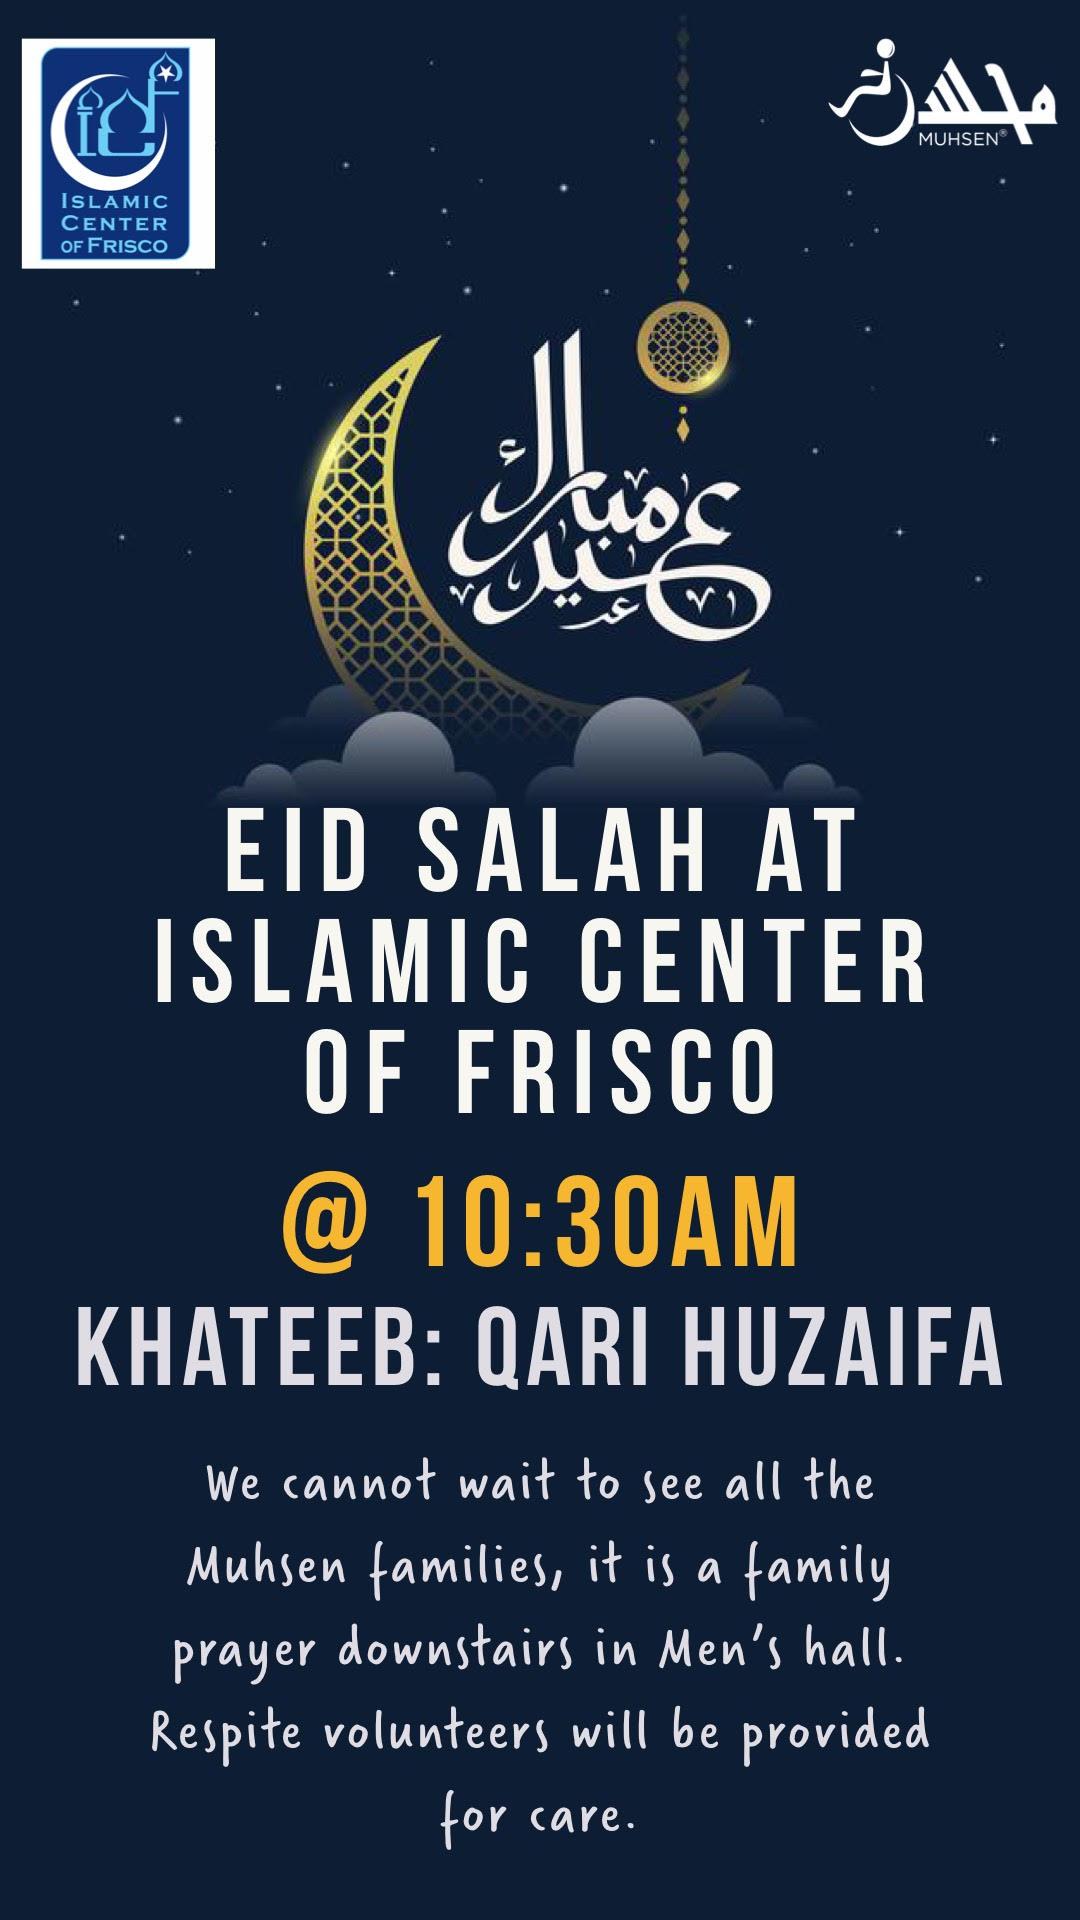 Islamic Center of Frisco Eid Salah Flyer